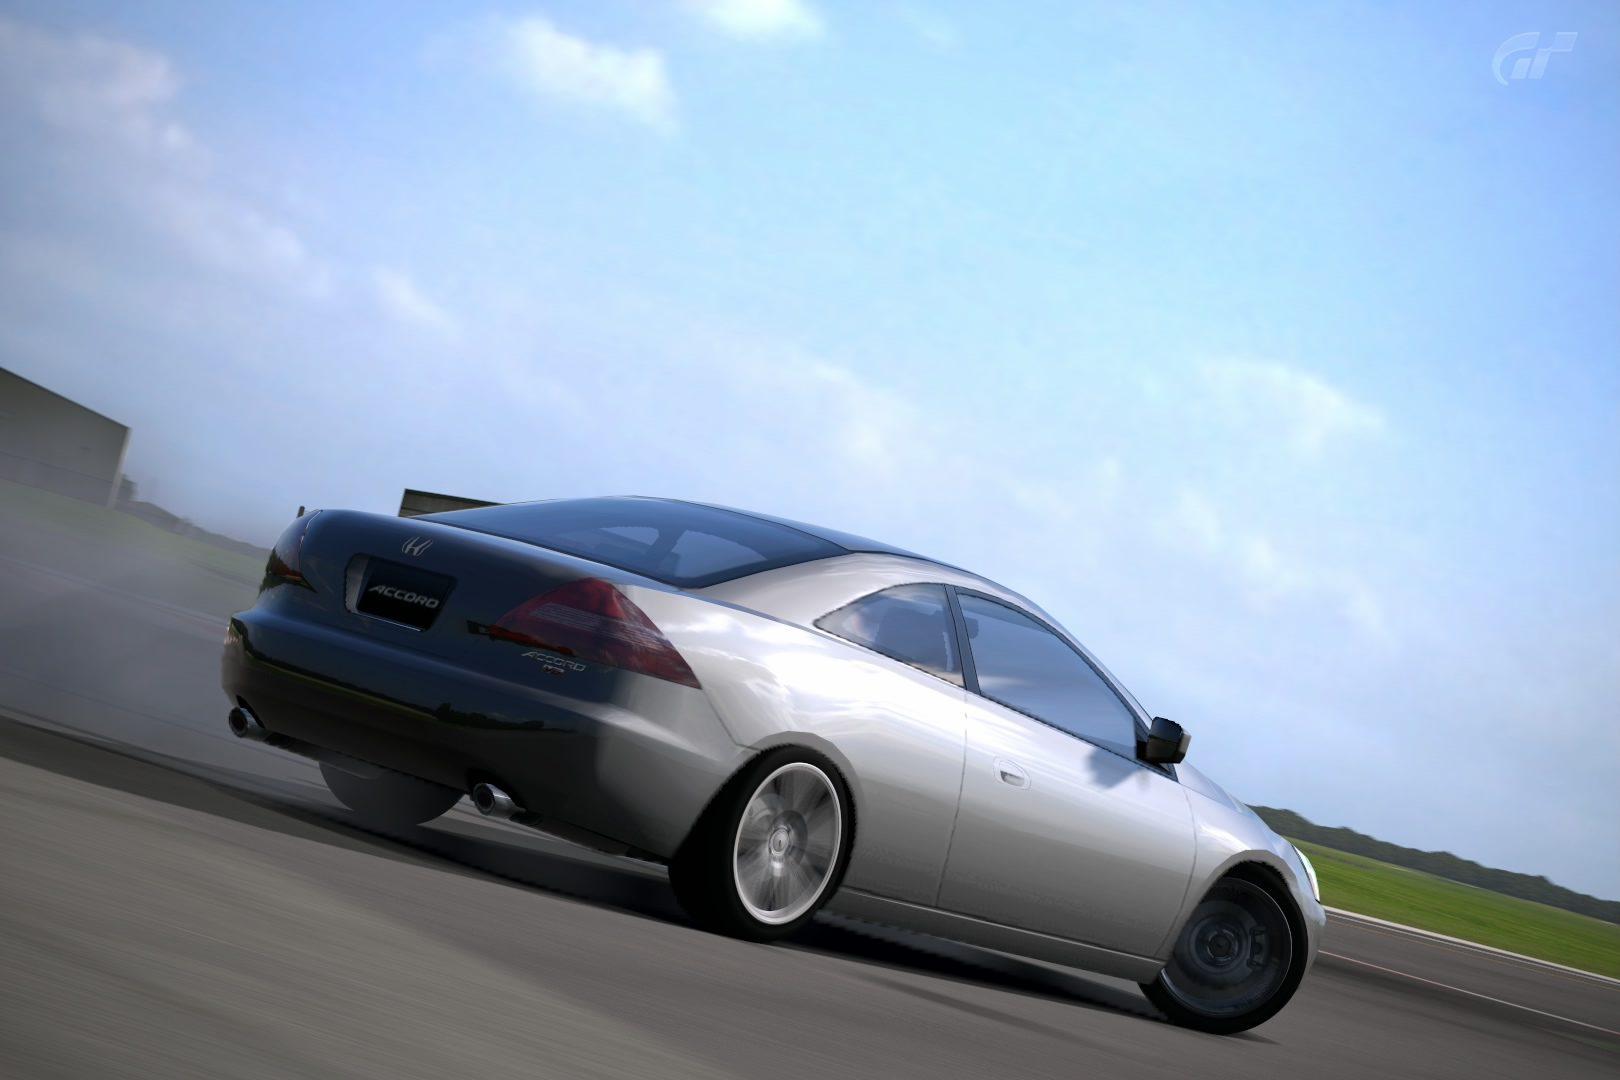 The Top Gear Test Track_3.jpg